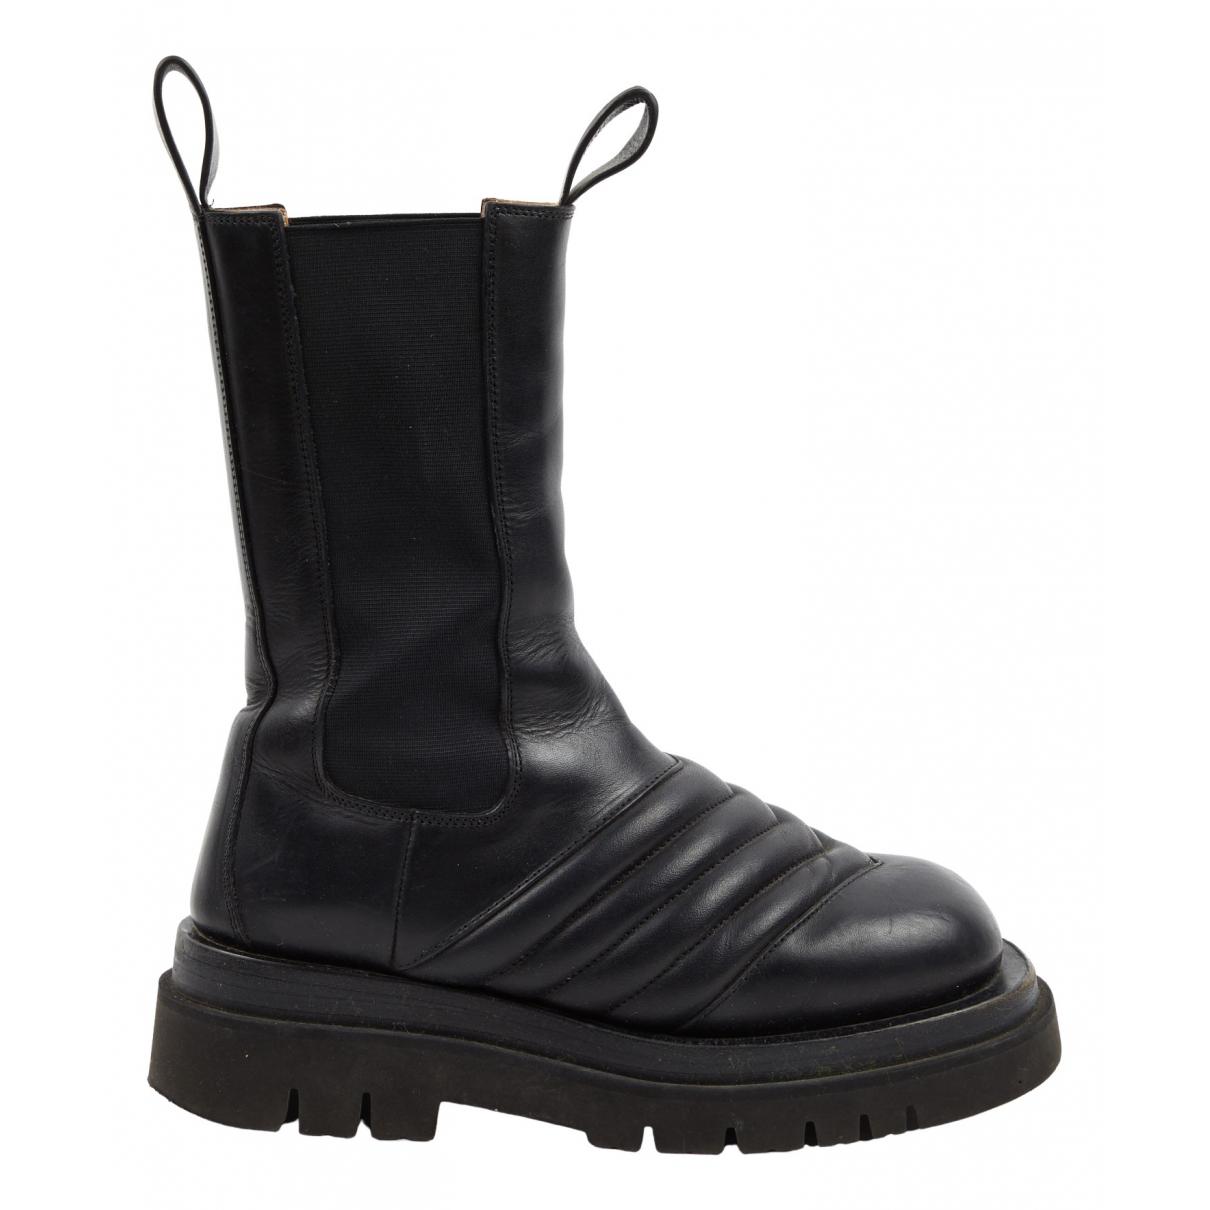 Bottega Veneta \N Black Leather Boots for Women 37.5 EU